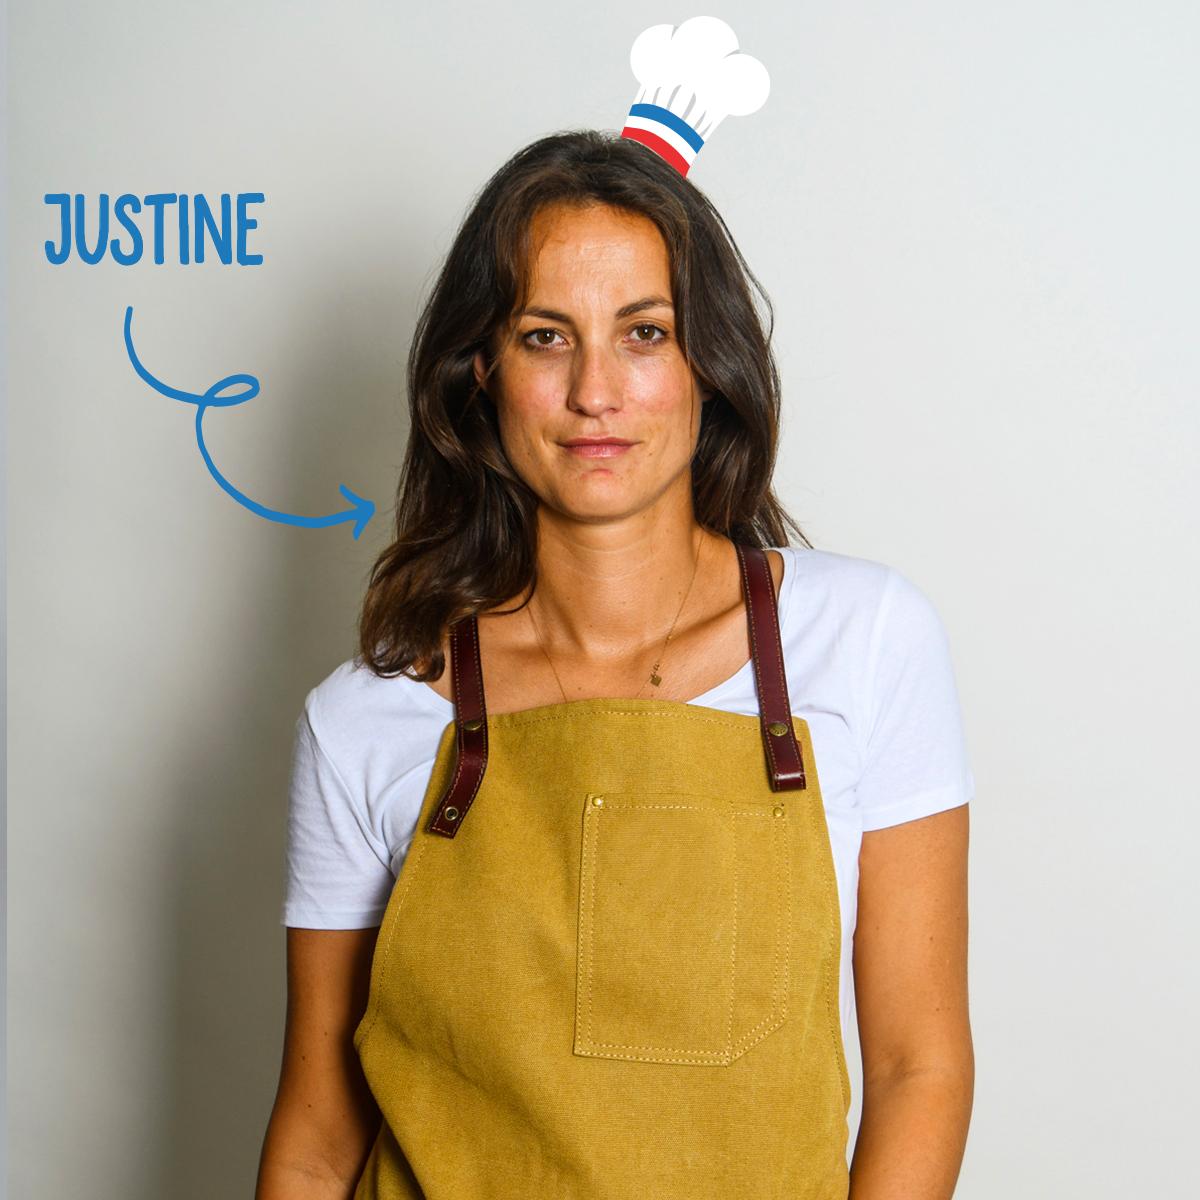 Justine - Le Collectif